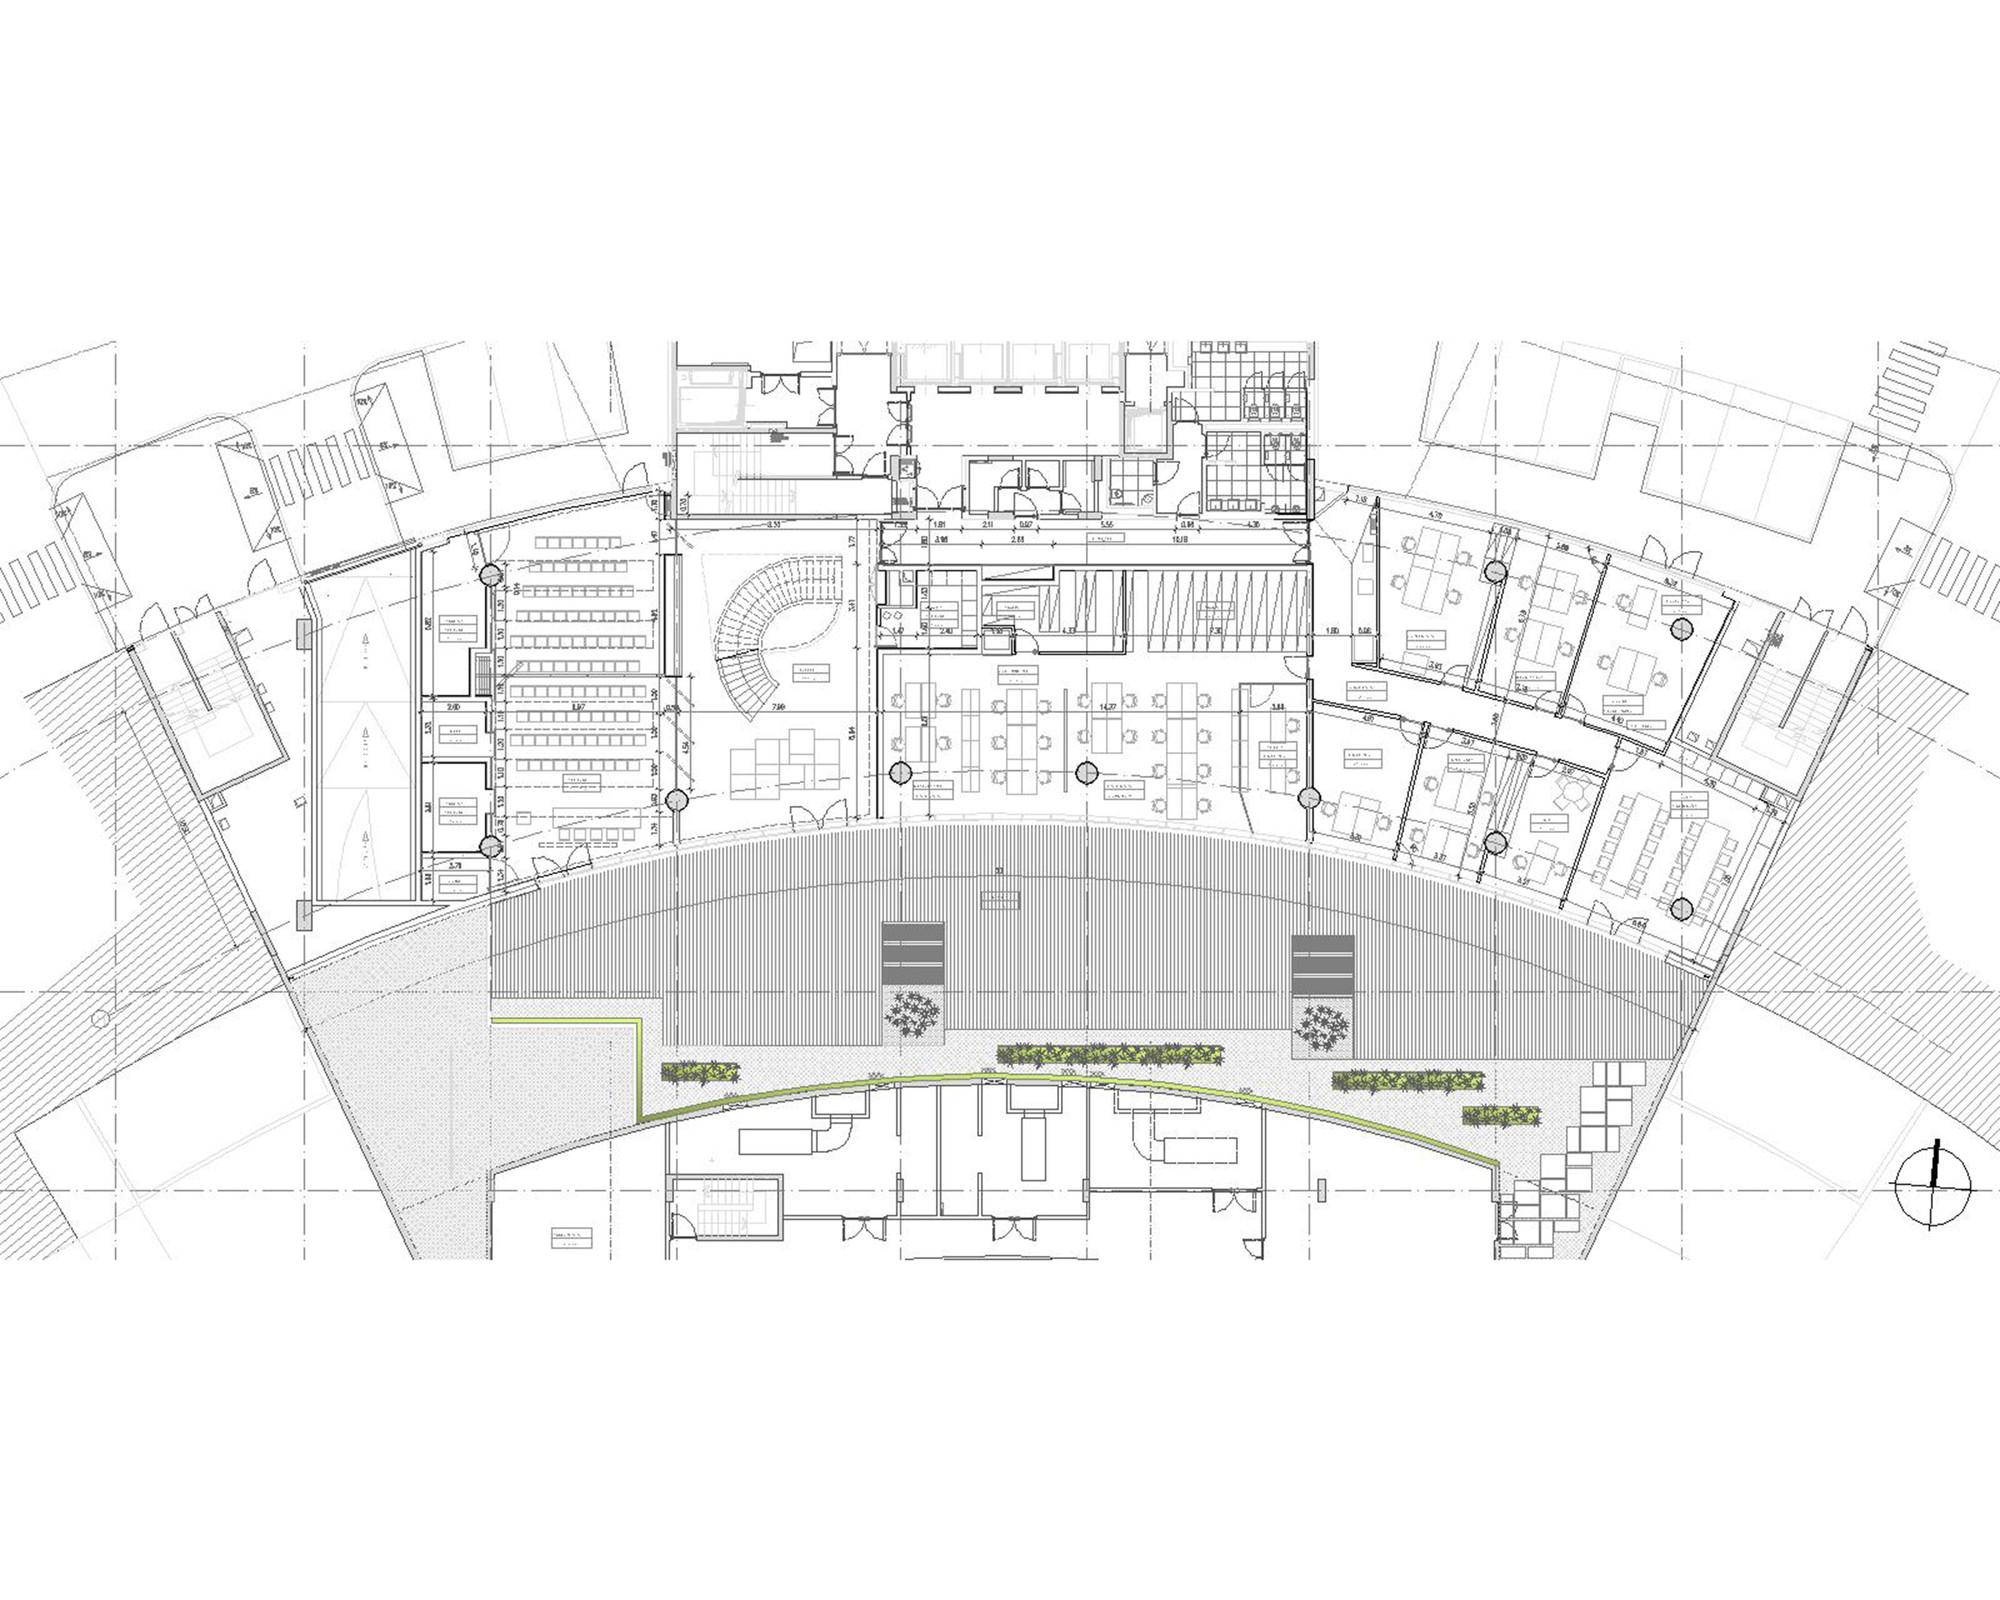 Amazing Law Office Floor Plan Ideas Flooring amp Area Rugs